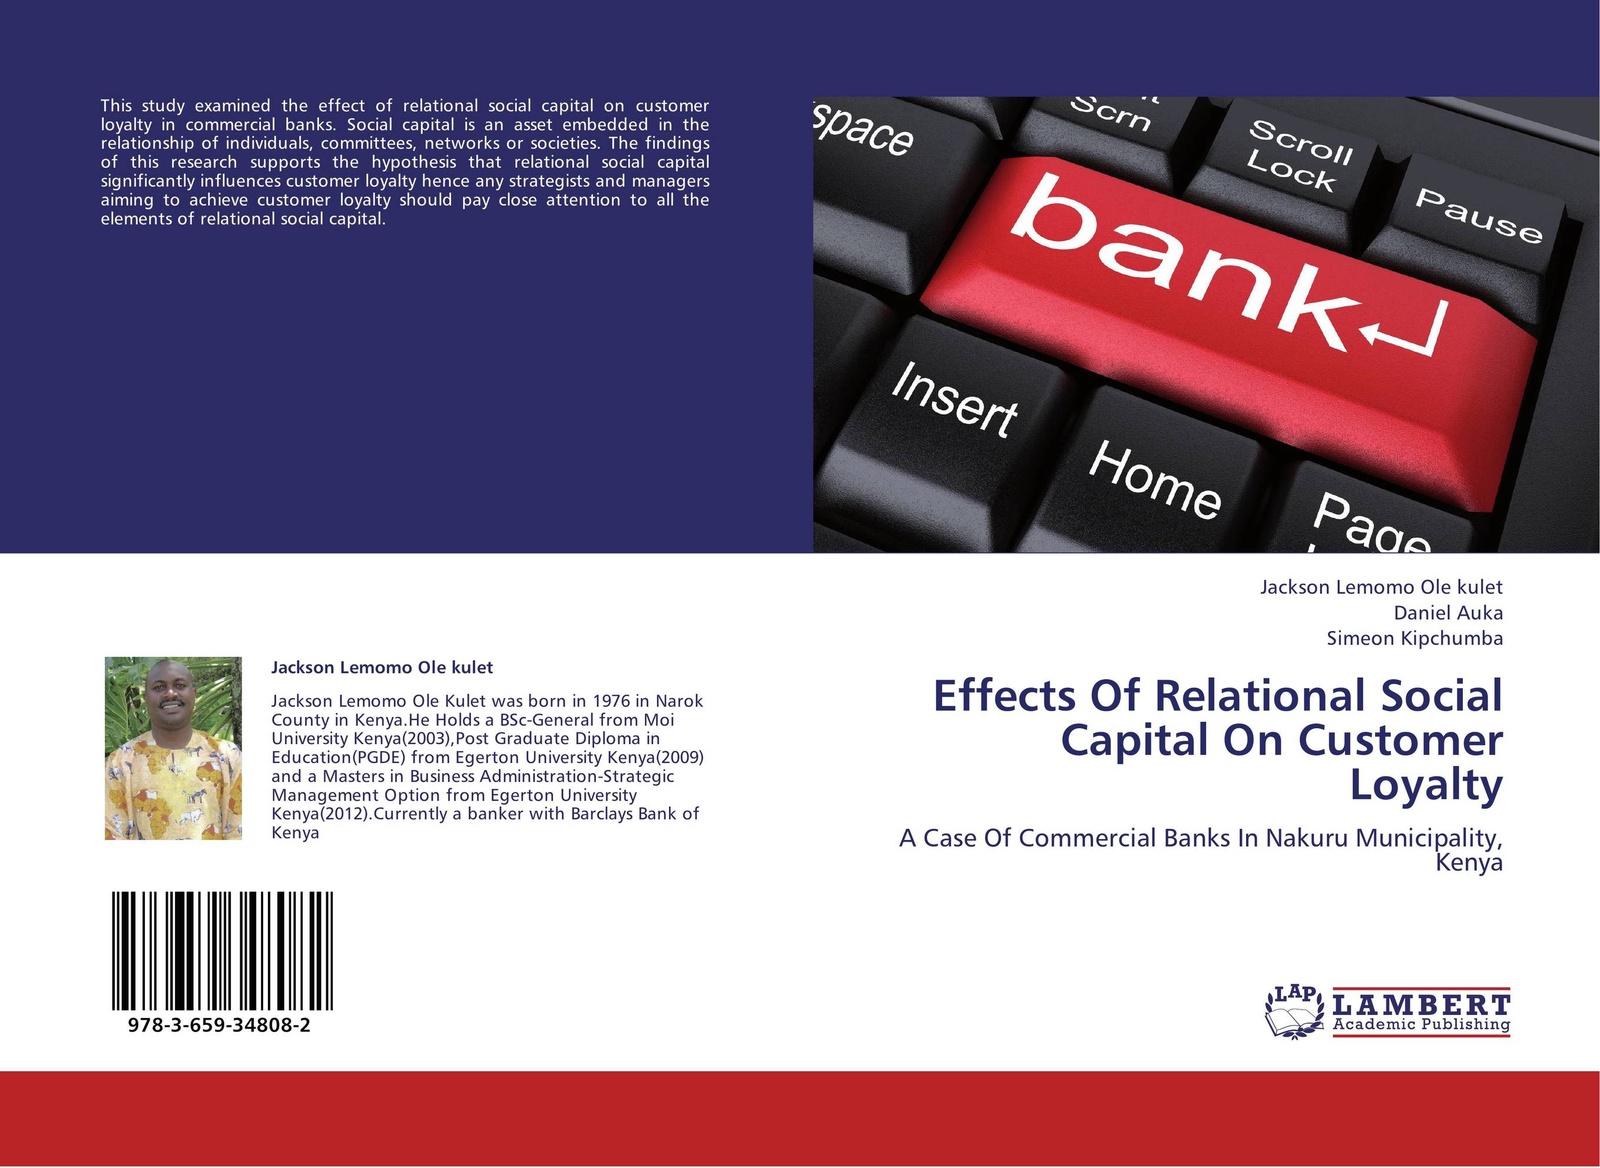 Jackson Lemomo Ole kulet,Daniel Auka and Simeon Kipchumba Effects Of Relational Social Capital On Customer Loyalty role of social capital in rural livelihood promotion